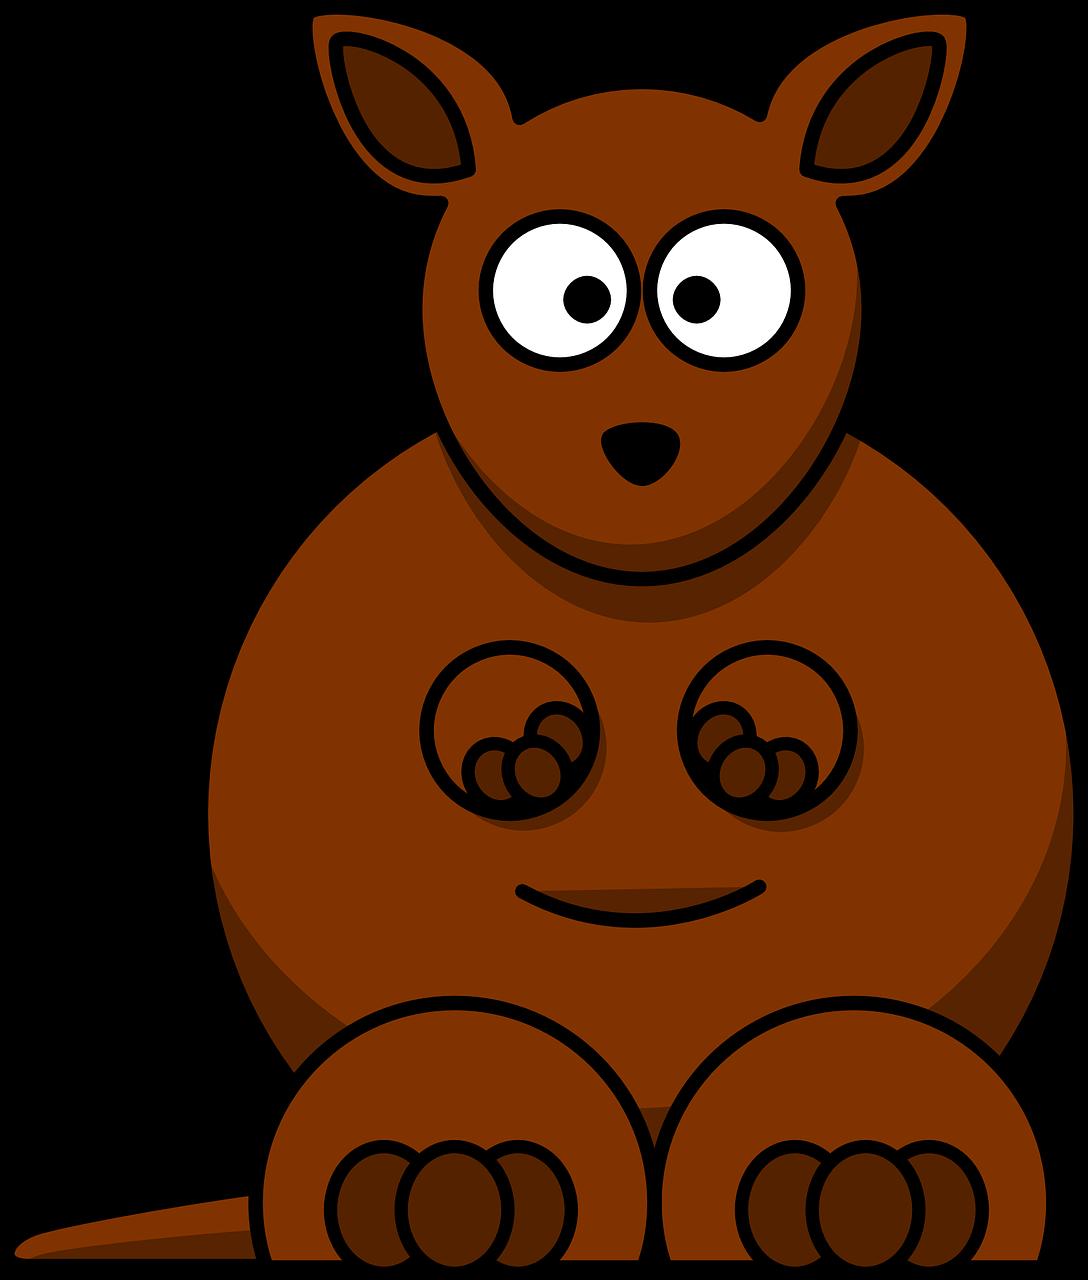 Free image on pixabay. Kangaroo clipart zoo animal